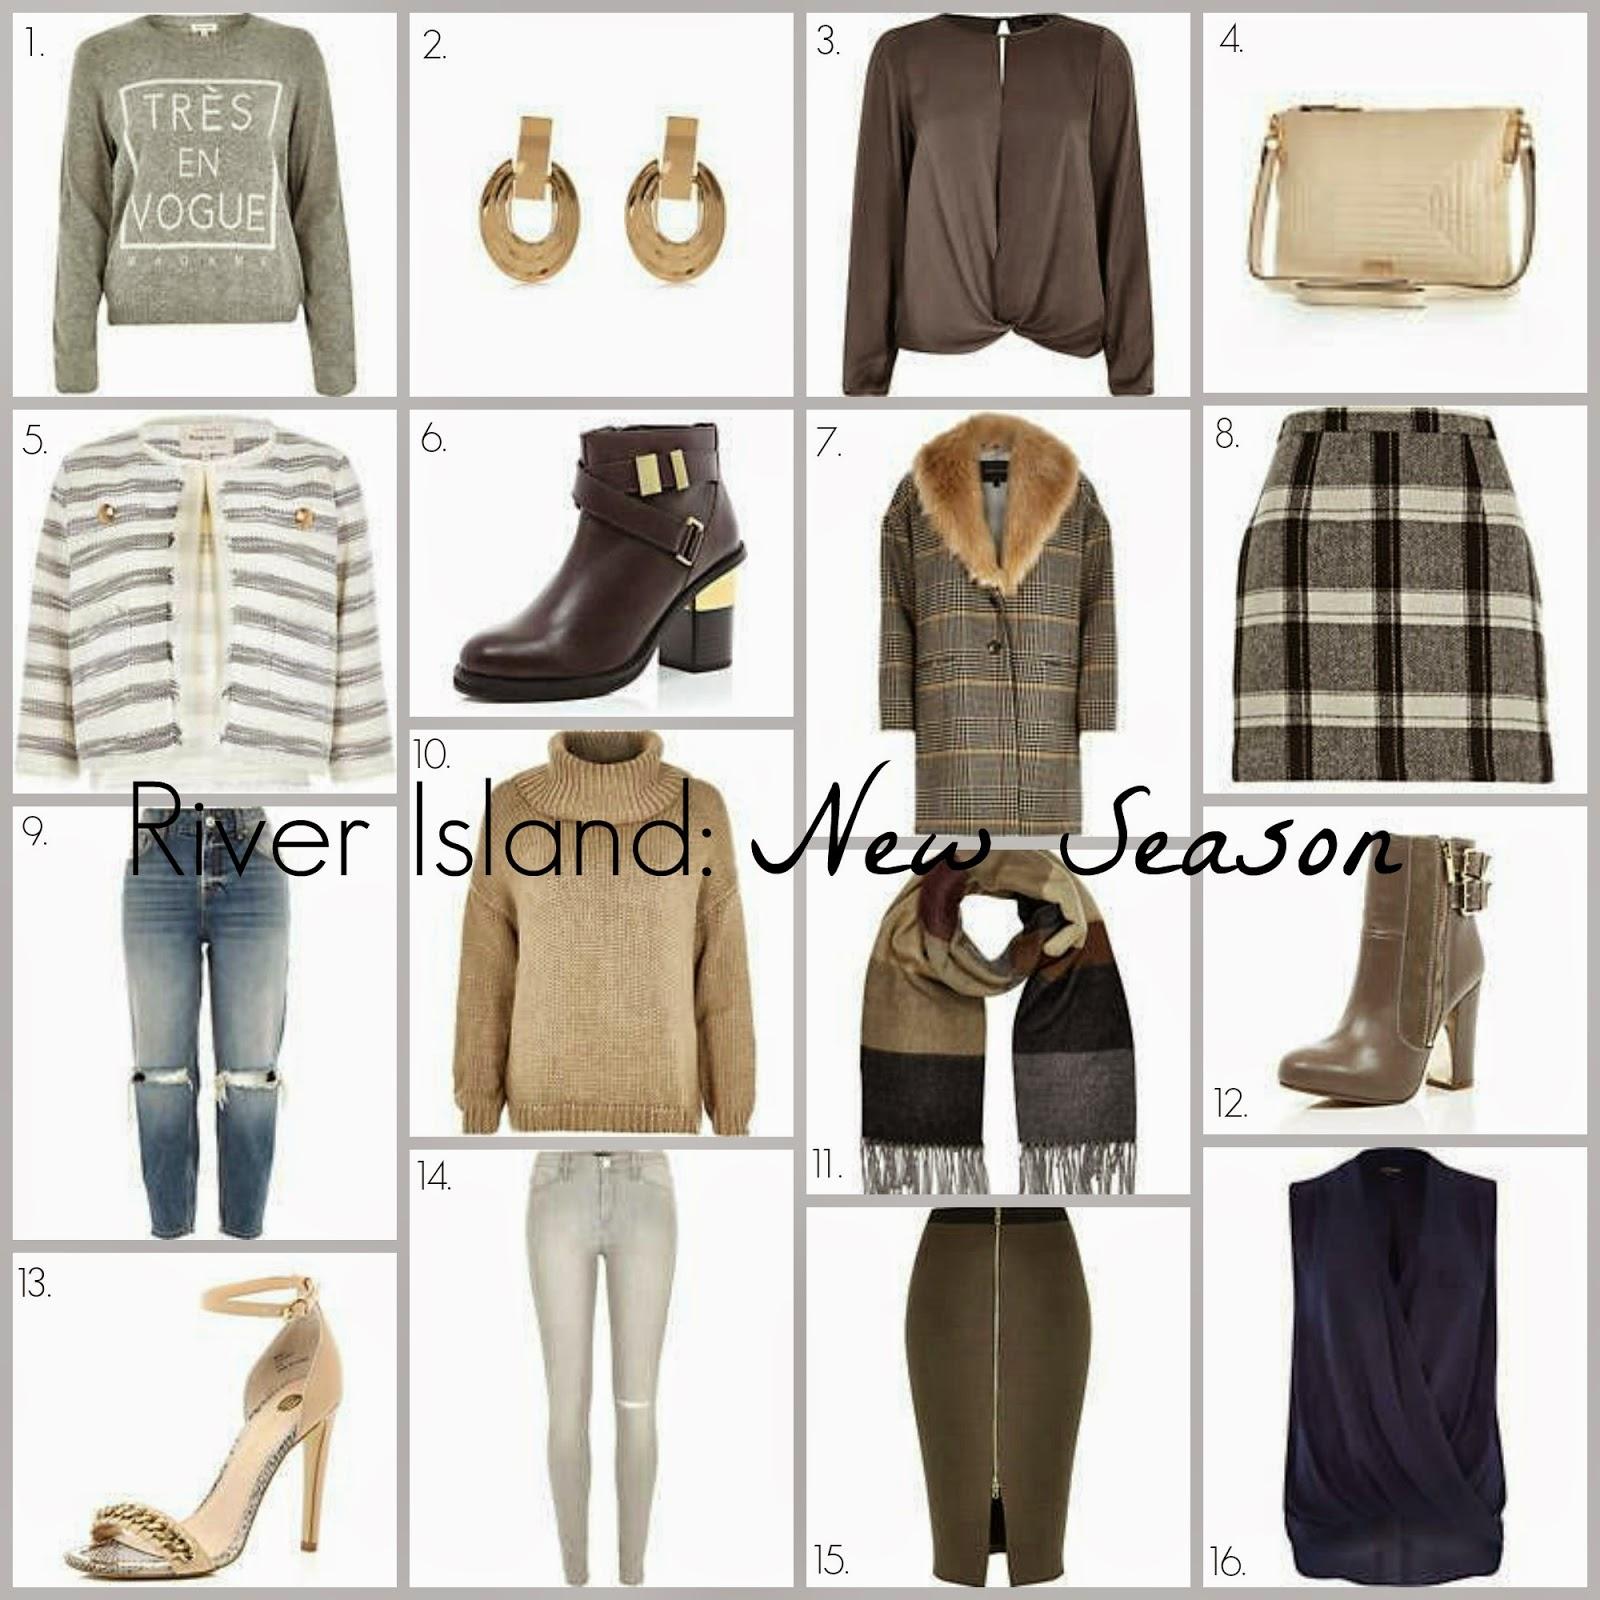 River Island New Season Clothing